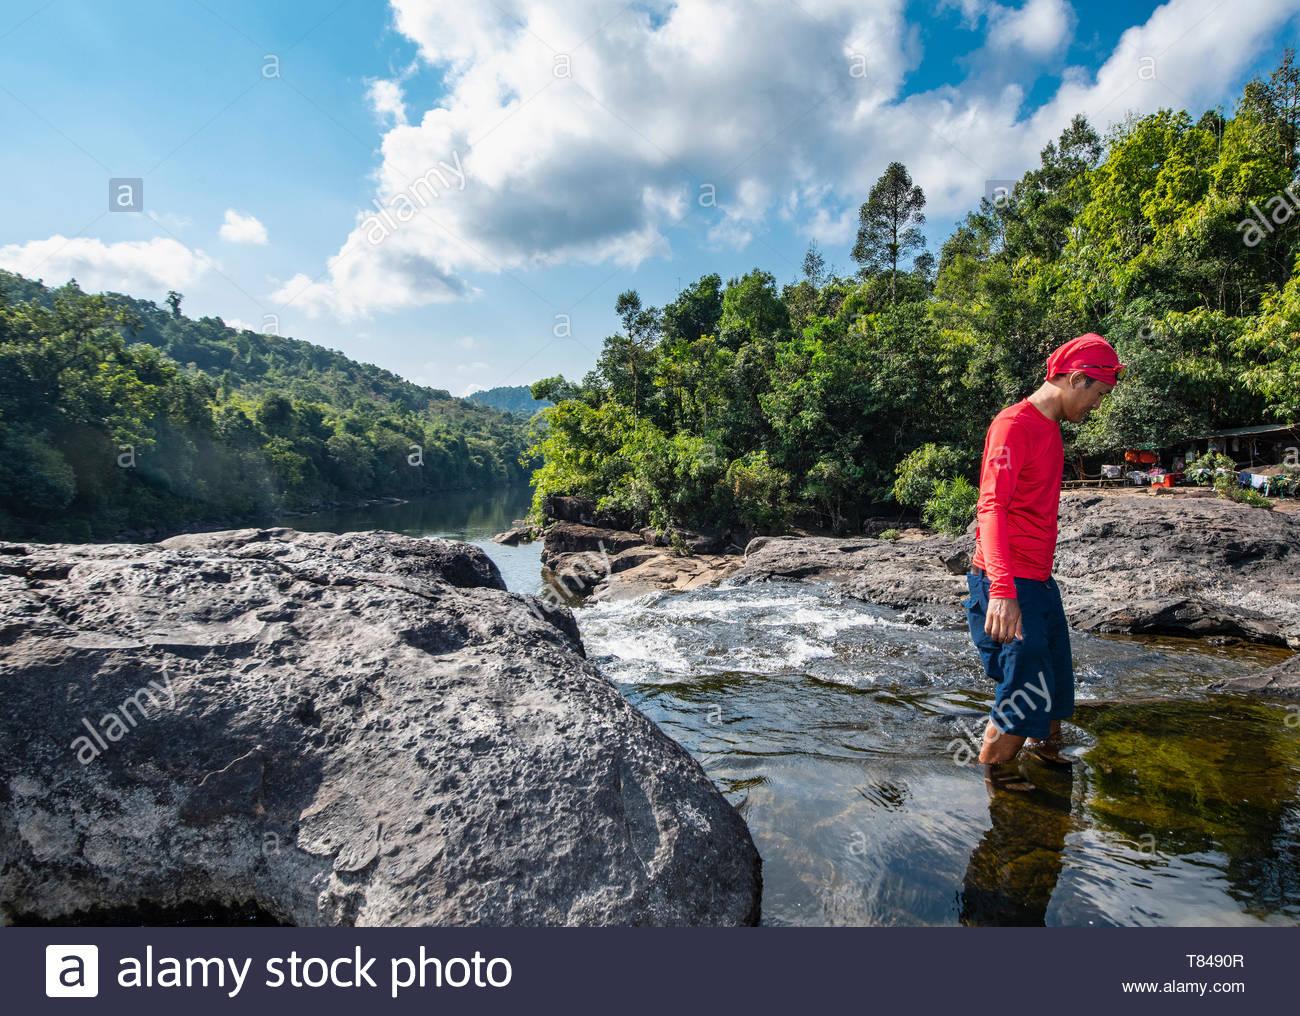 Mid adult man exploring Tatai river, Sihanoukville Province, Kampot, Cambodia - Stock Image